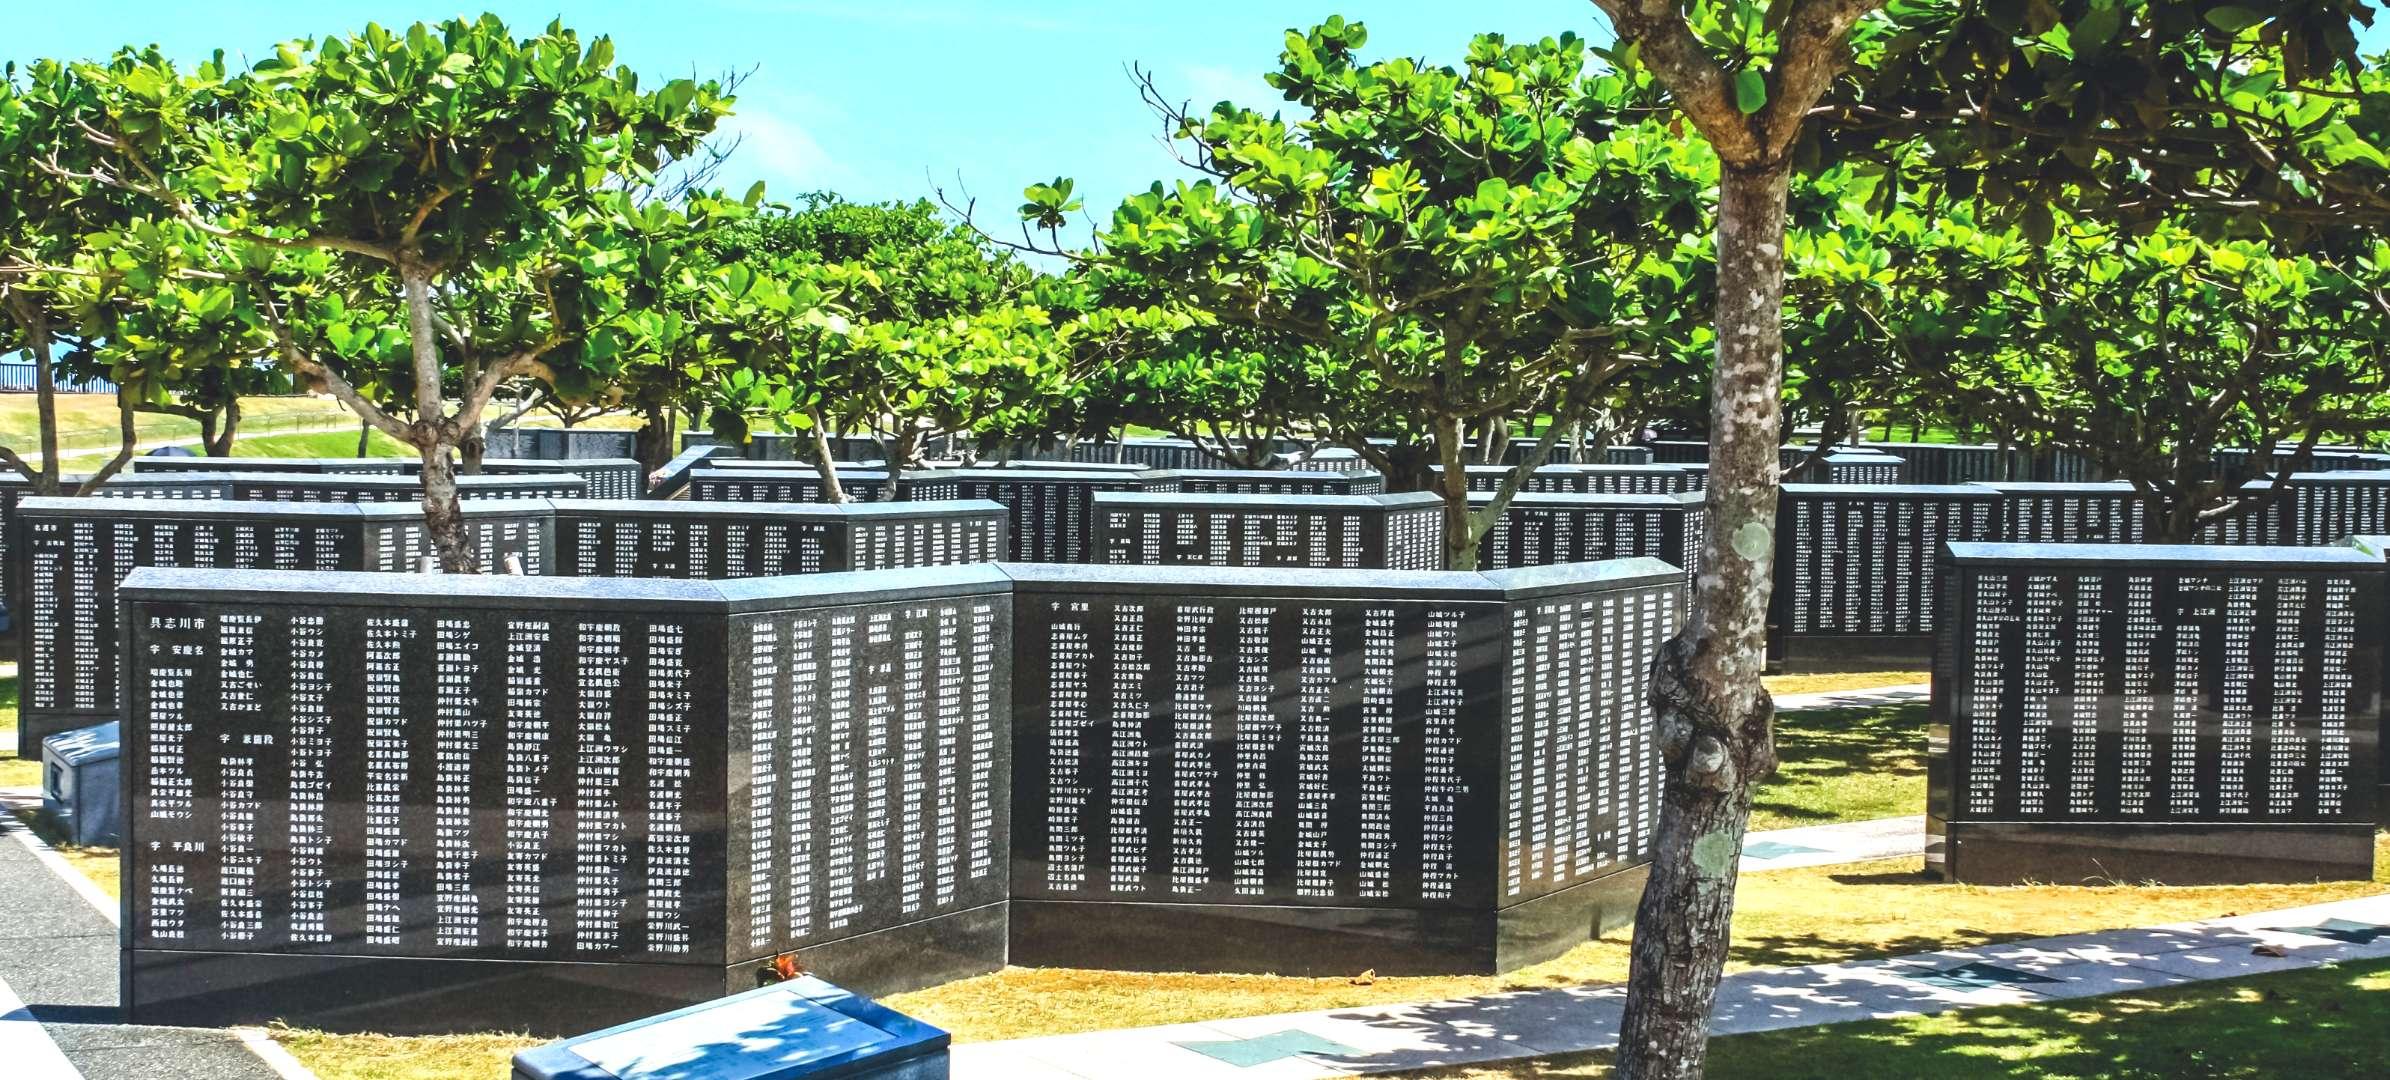 Peace Park Memorial Okinawa Japan Dave Hazzan